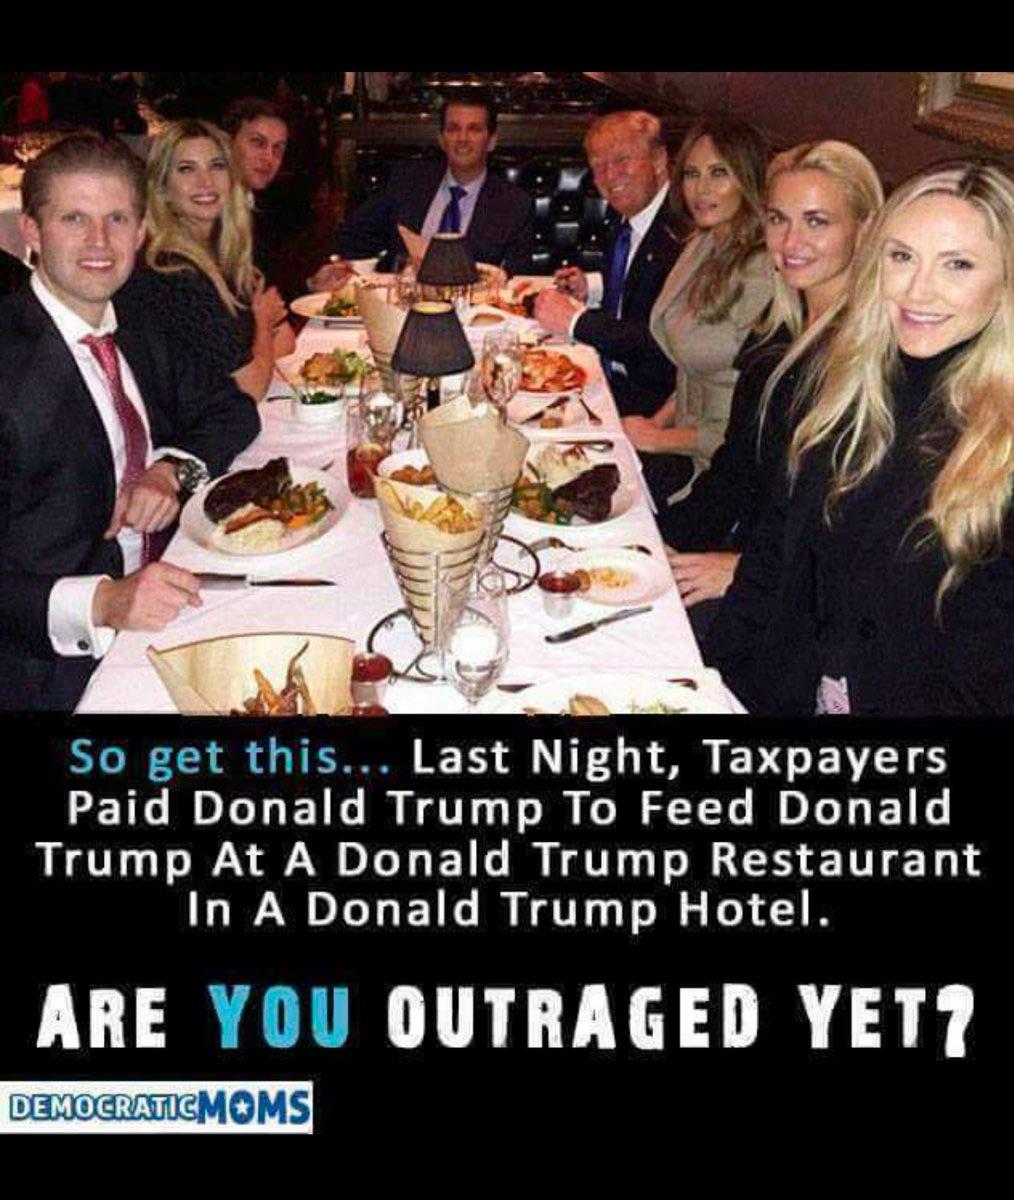 taxpayers-paid-donald-trump-hotel-restaurant